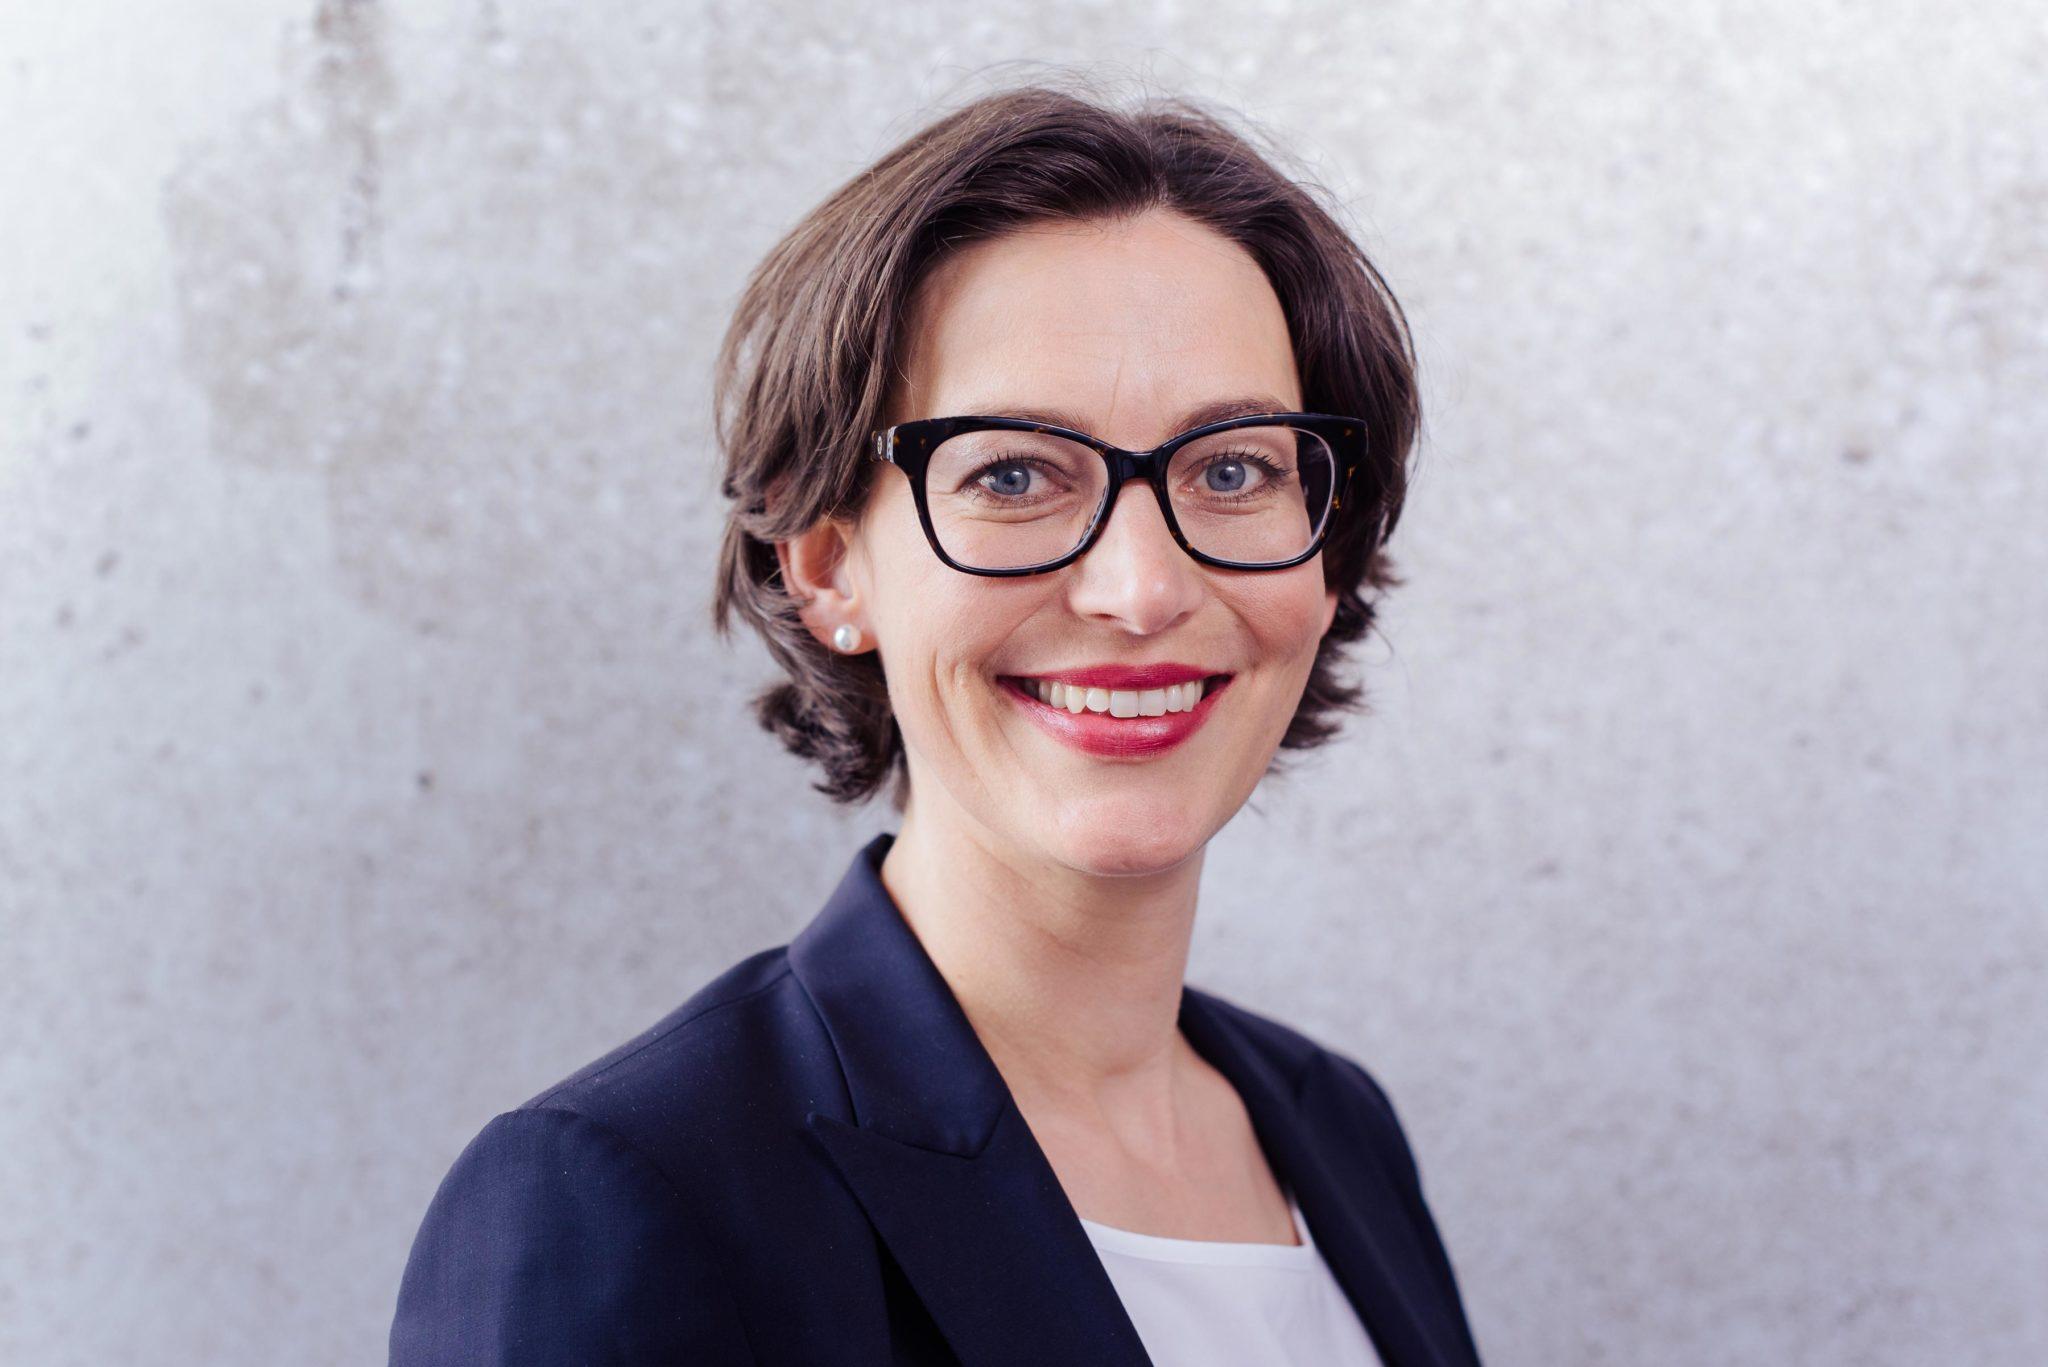 Stephanie Tilenius Videobewerbung